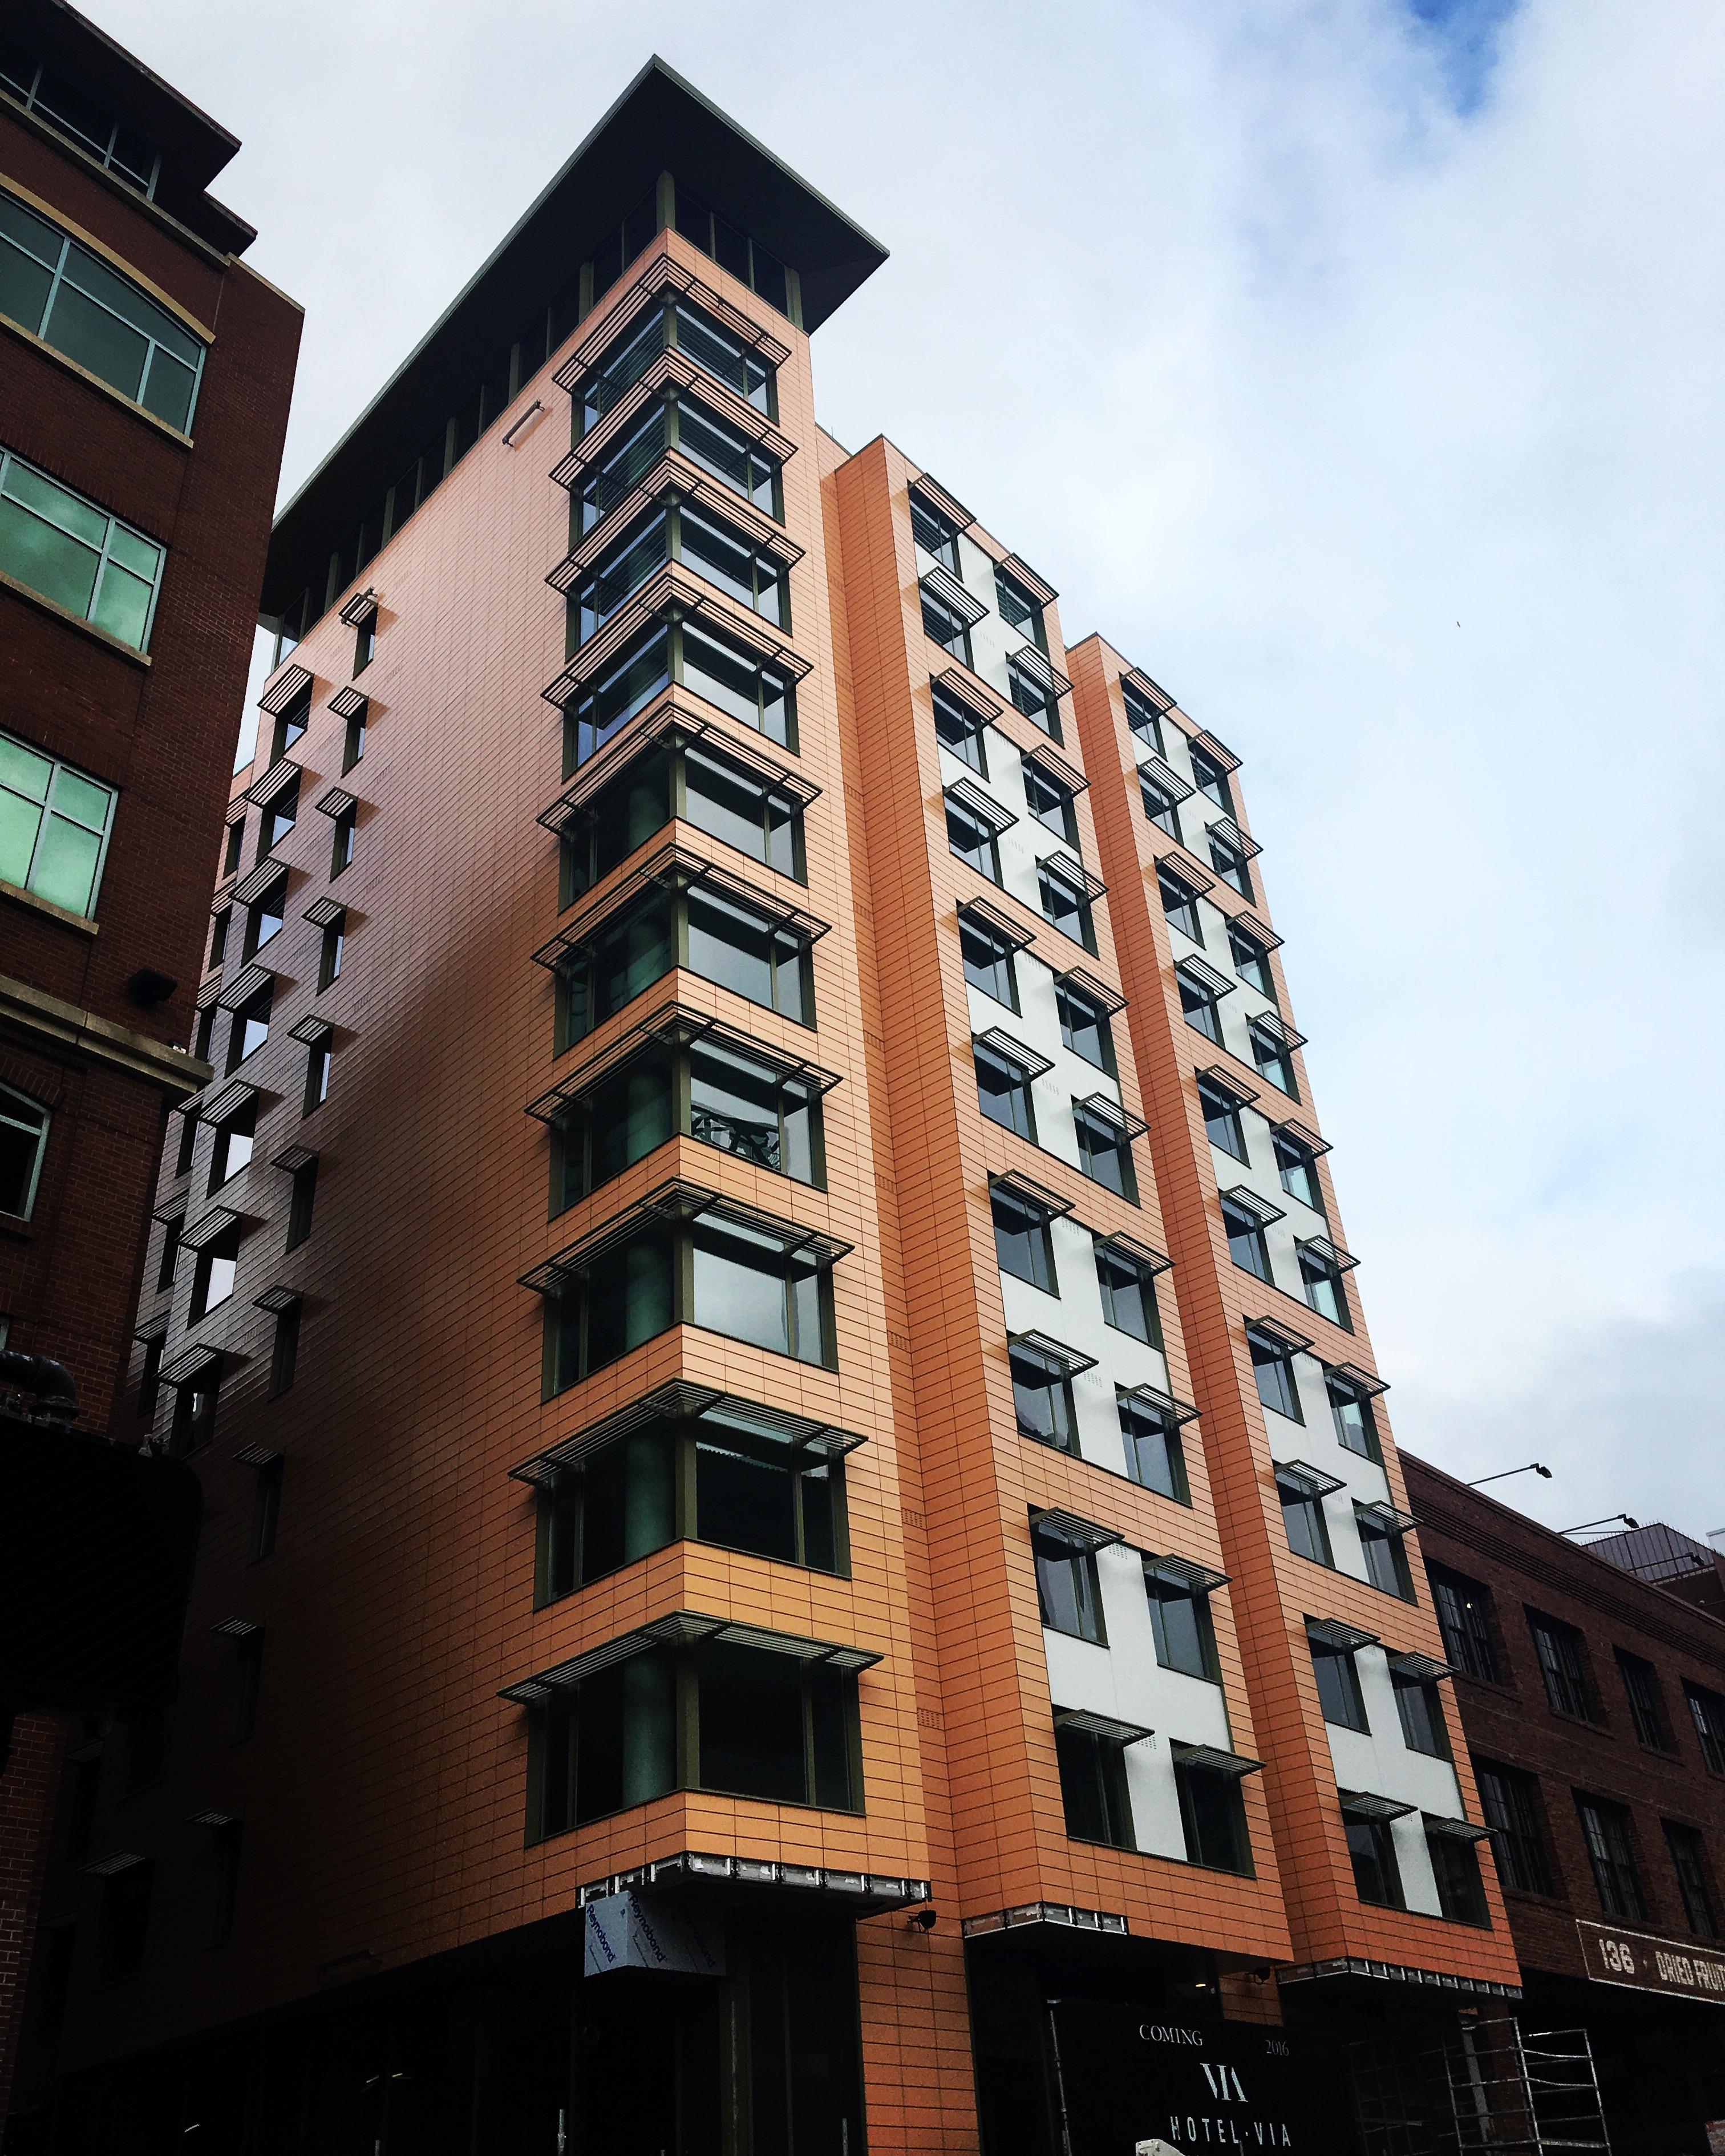 Exterior of 12-story hotel, very contemporary.